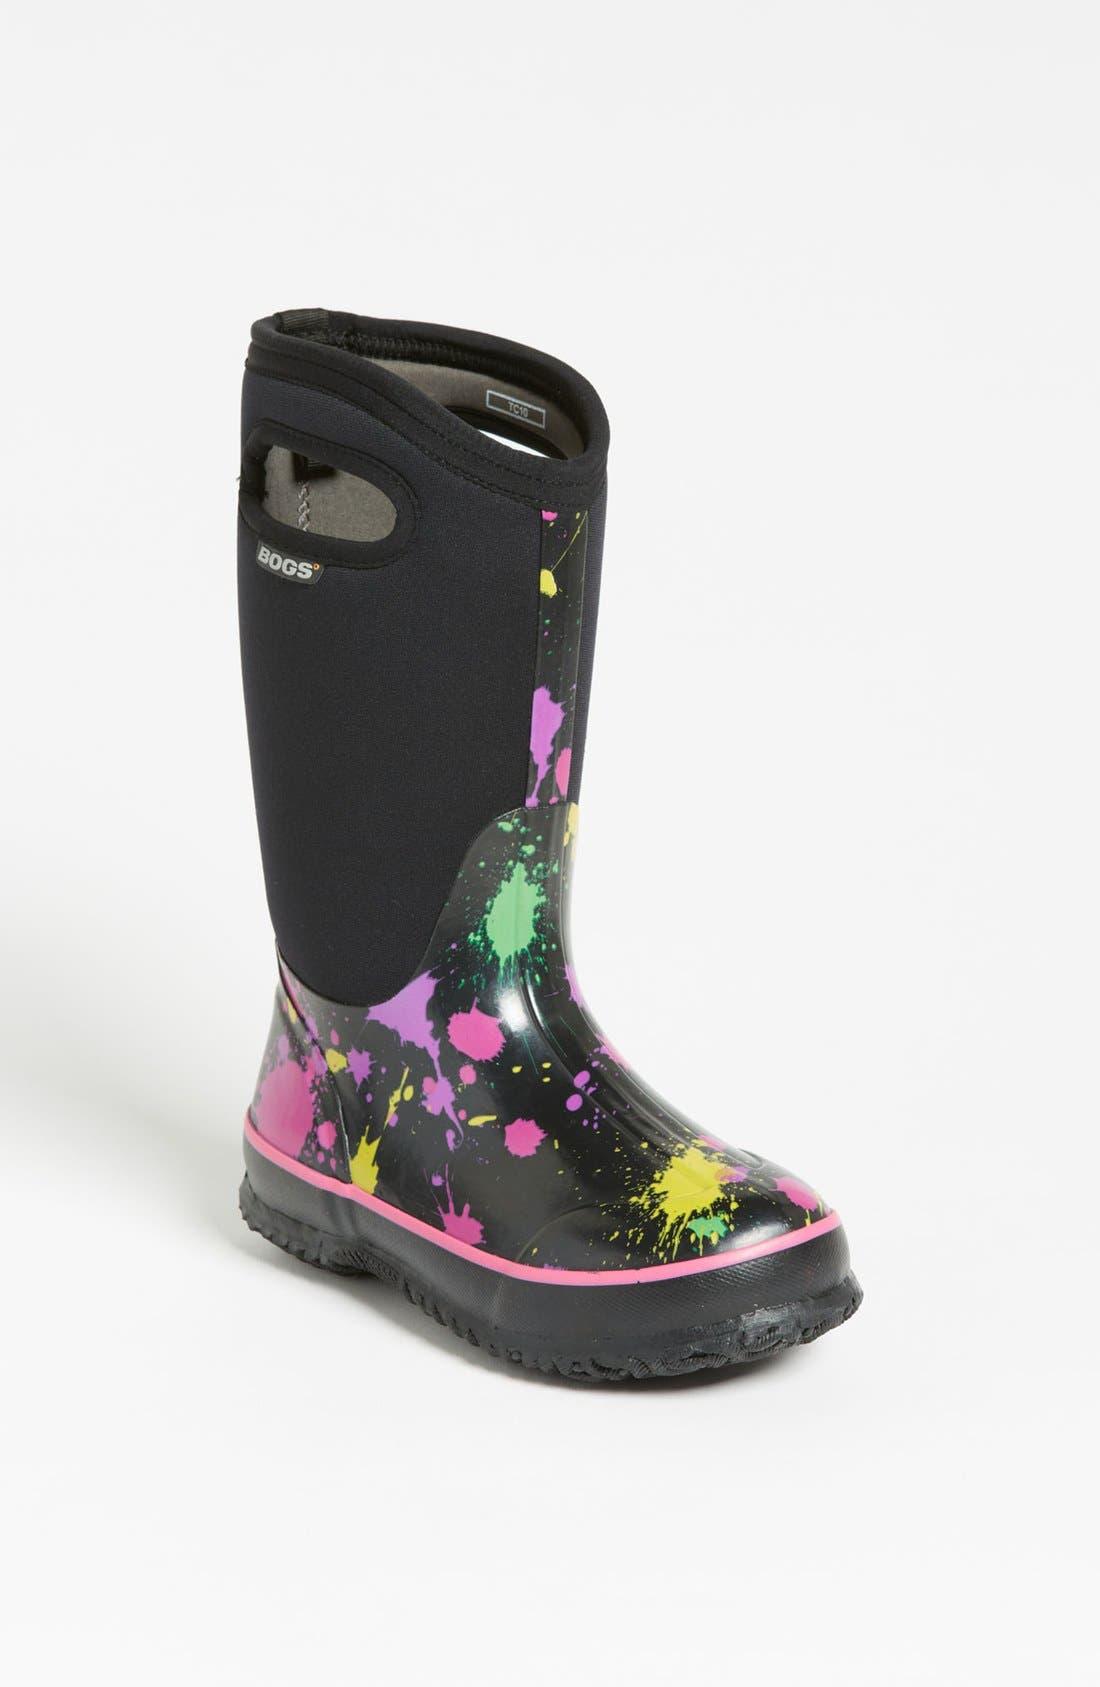 Main Image - Bogs 'Classic High - Paint Splat' Waterproof Boot (Toddler, Little Kid & Big Kid)